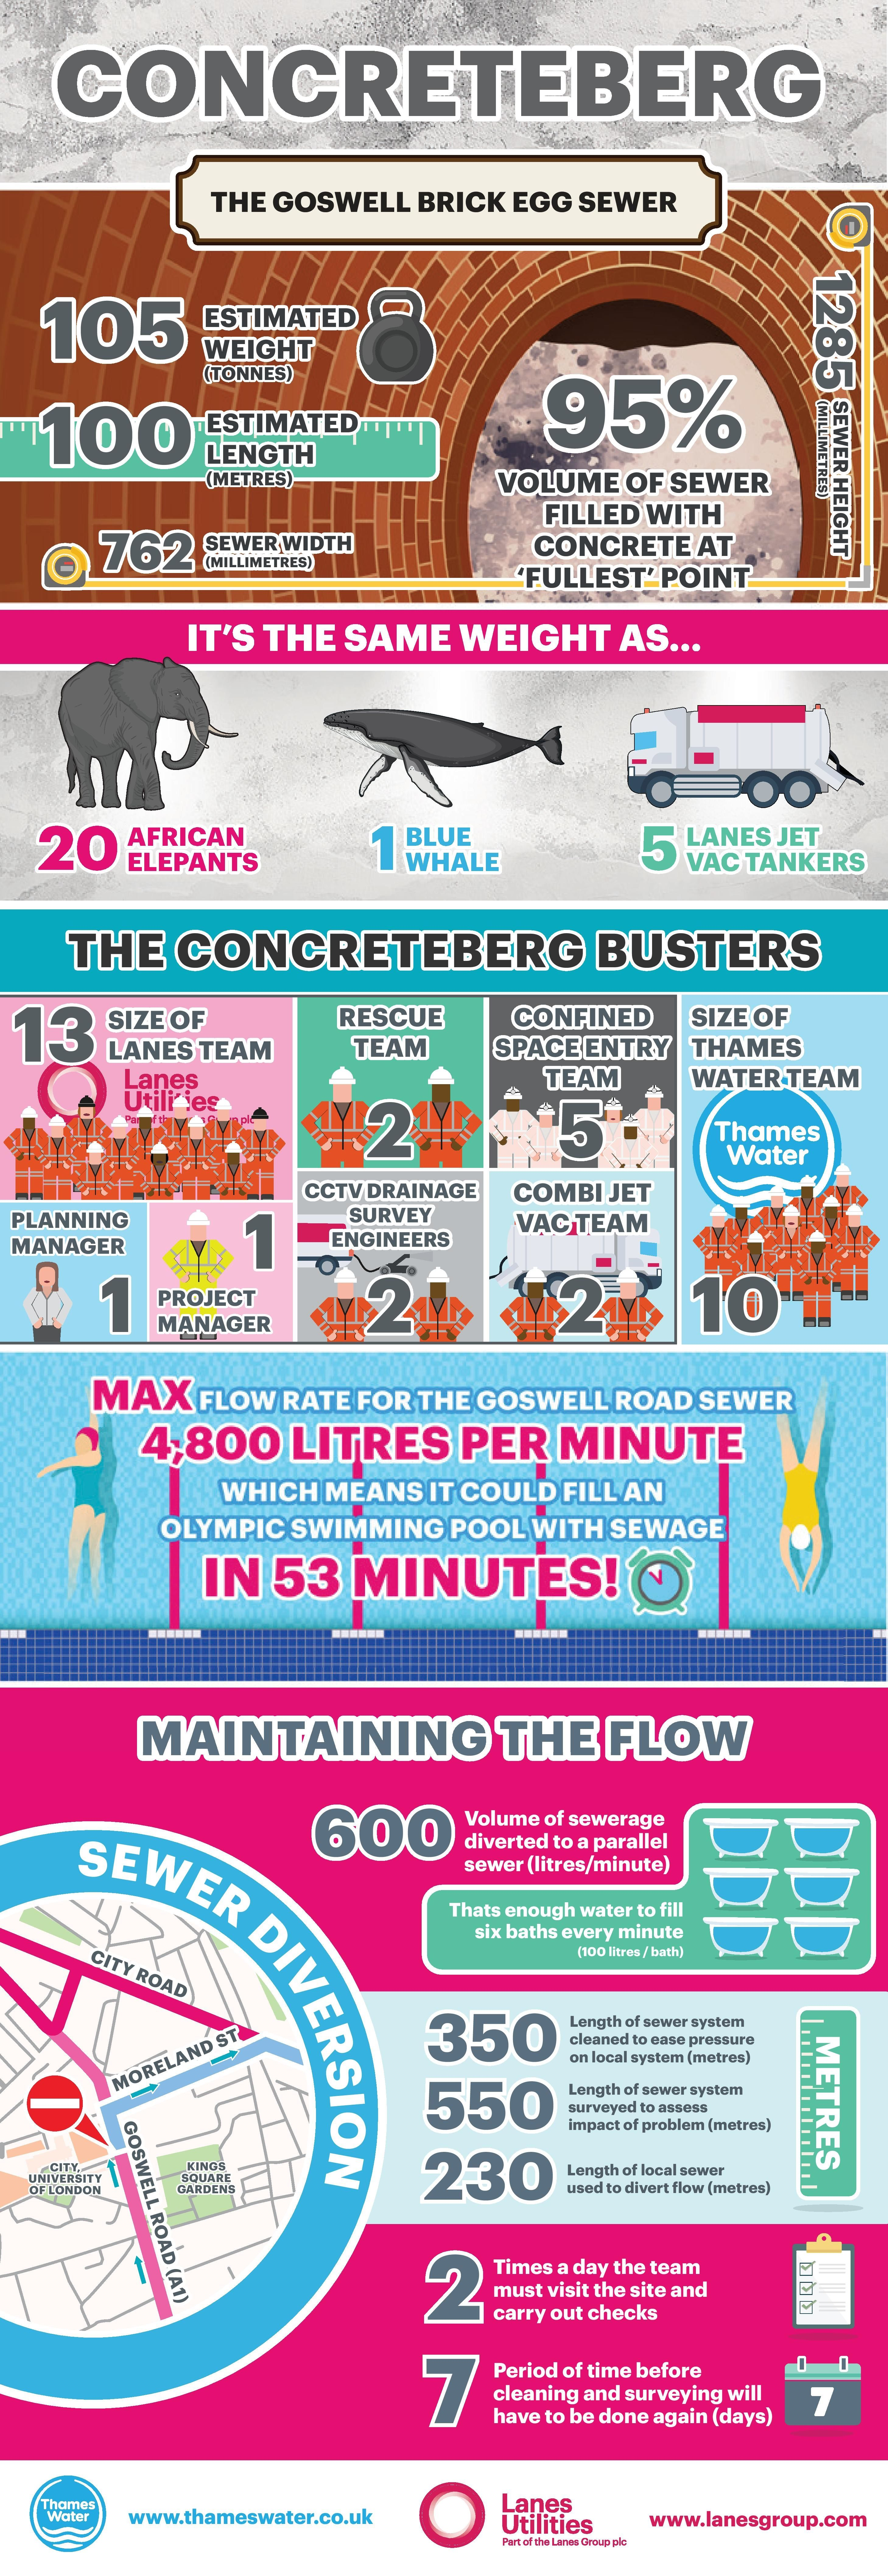 LD 29266 - Concreteberg infographic-LR-page-001